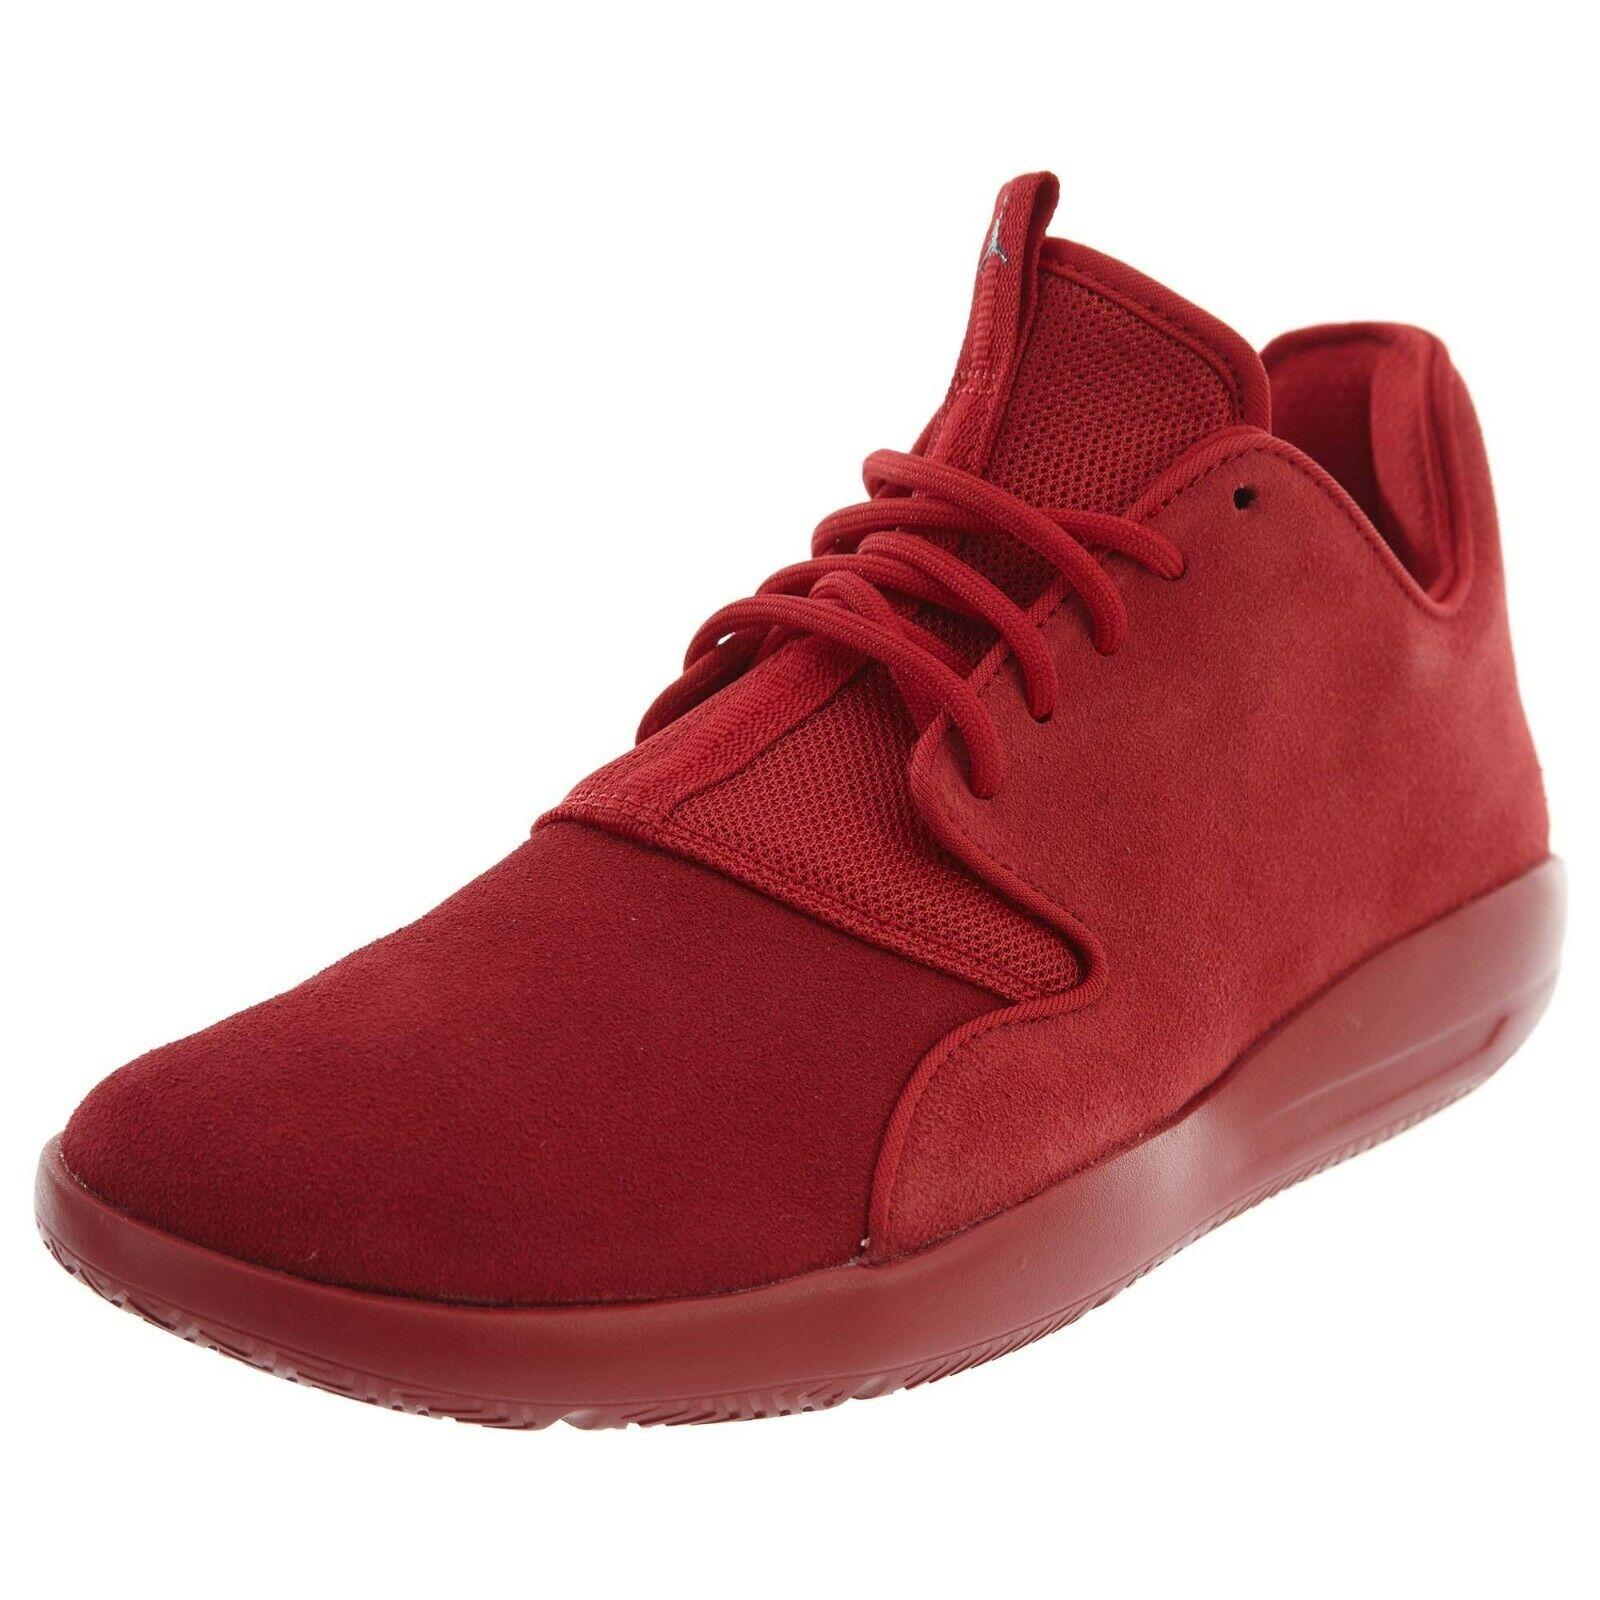 Jordan eclipse lea gym red